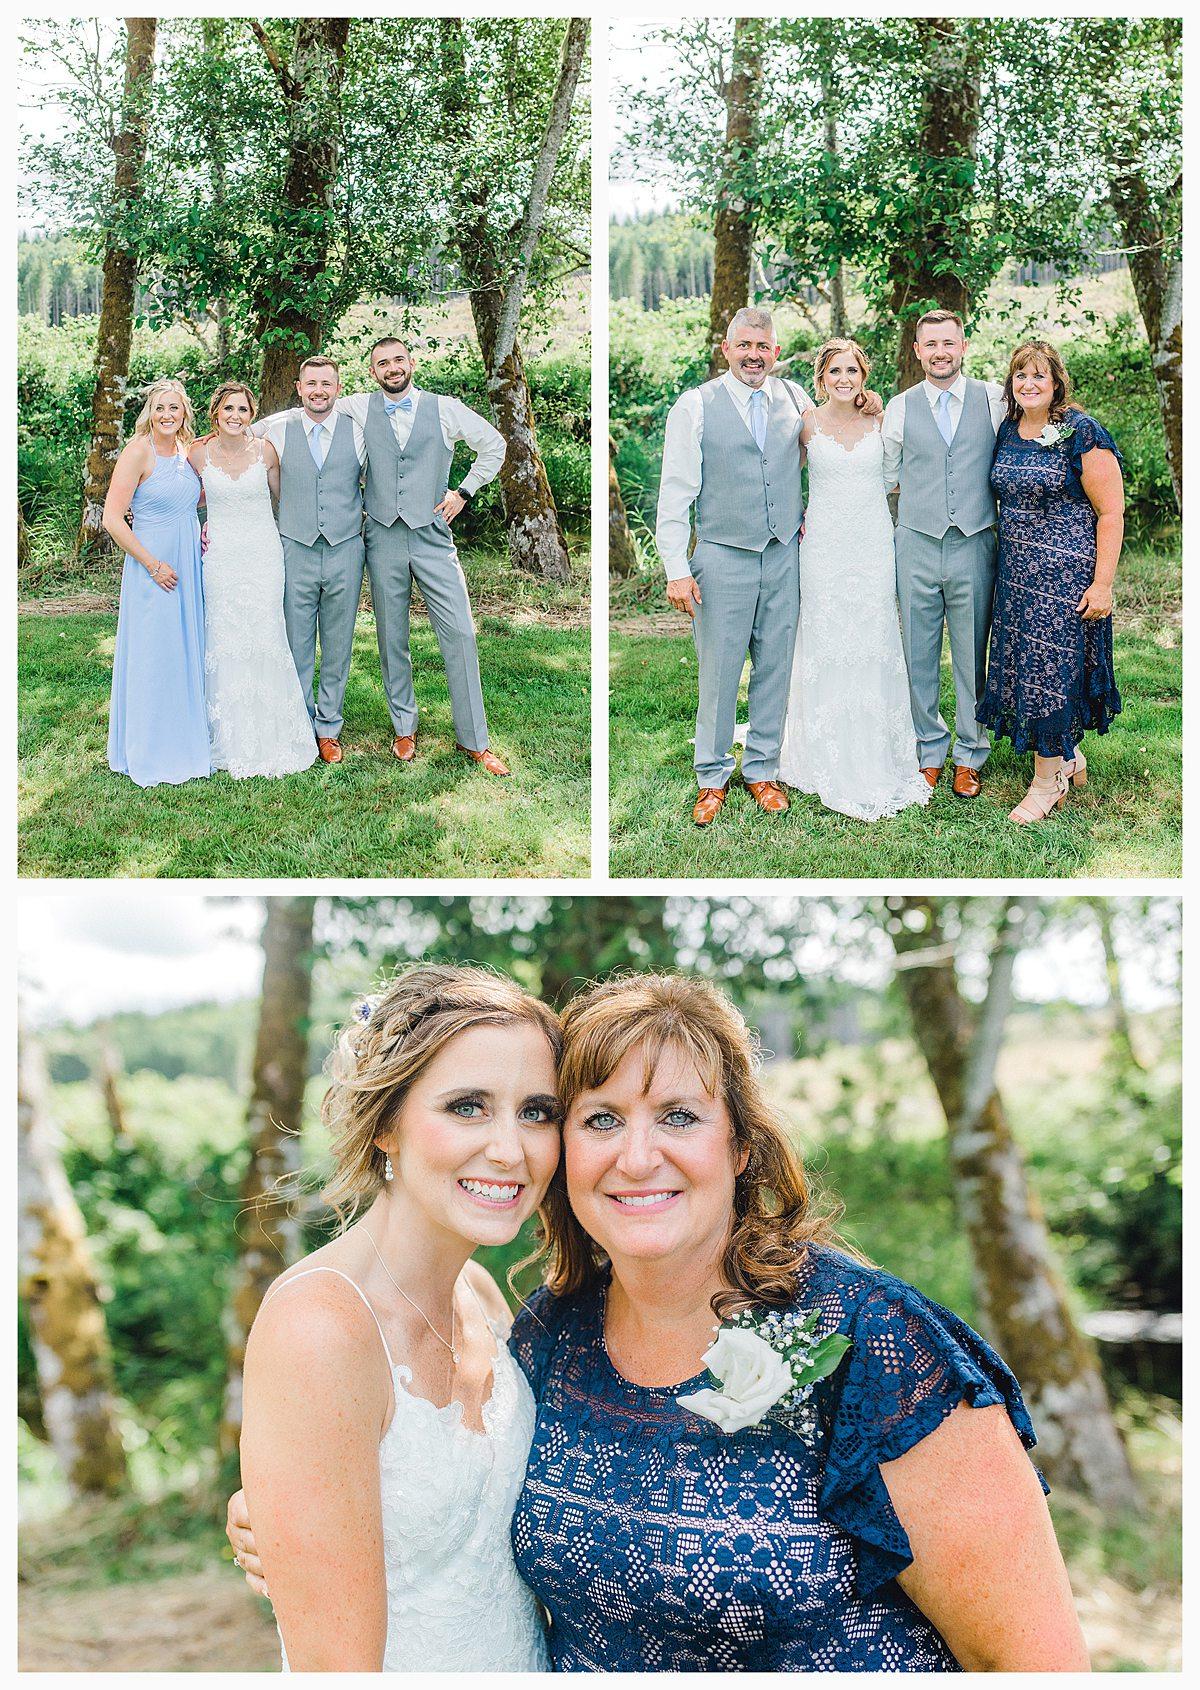 Rustic Coastal Blue Wedding in Southwest Washington, Emma Rose Company, Seattle and Portland Wedding Photographer, Light and Airy_0112.jpg